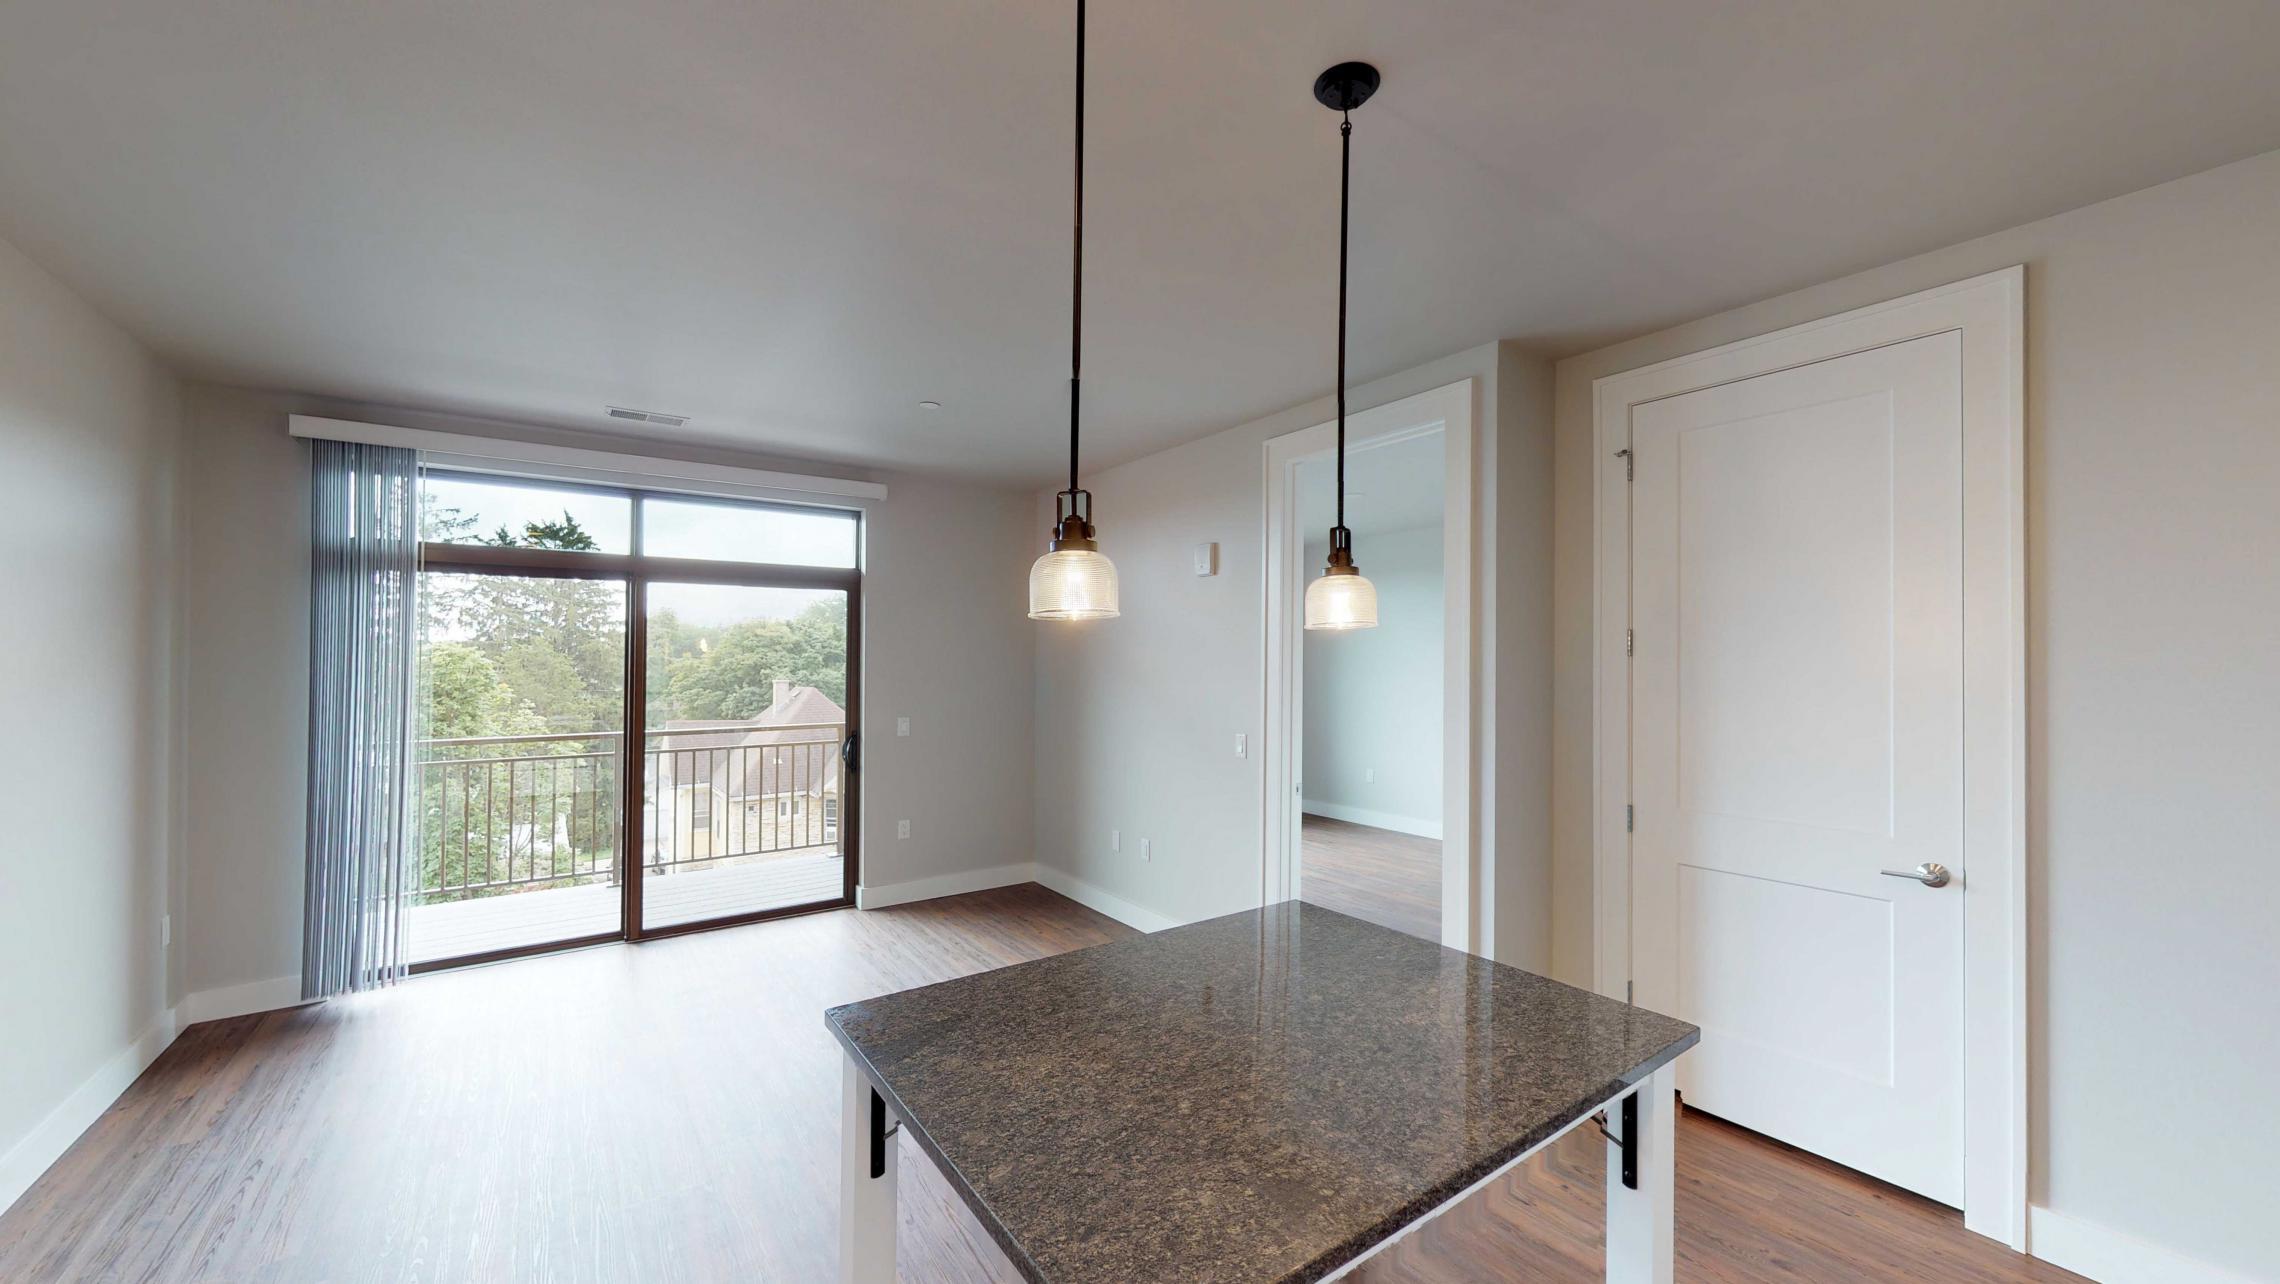 1722-Monroe-Apartment-One Bedroom-Modern-Luxury-Kitchen-Design-Living-Balcony.jpg